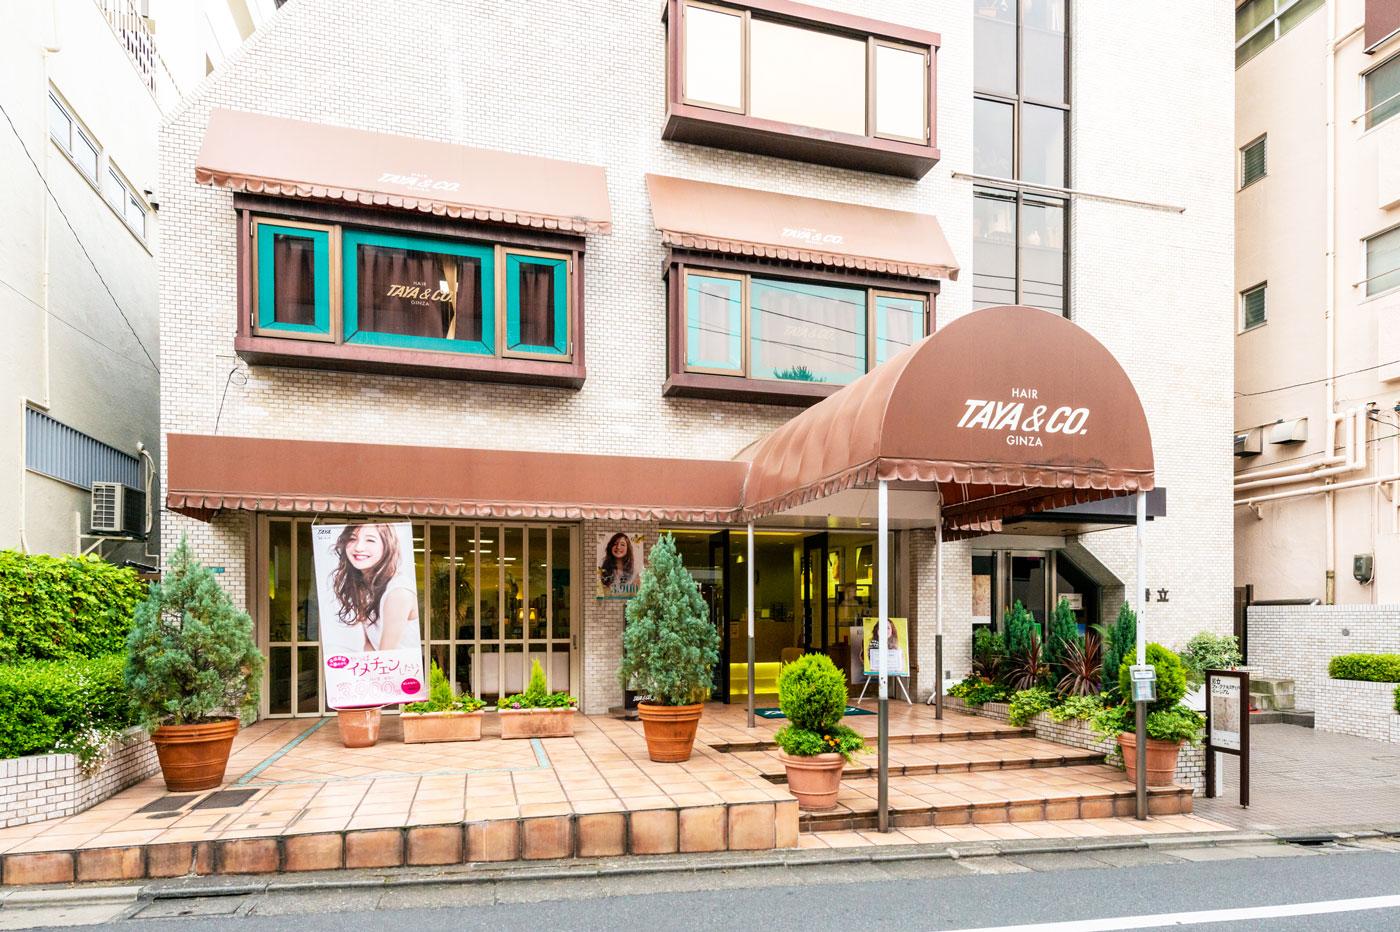 Taya&Co.GINZA自由が丘店(550m)